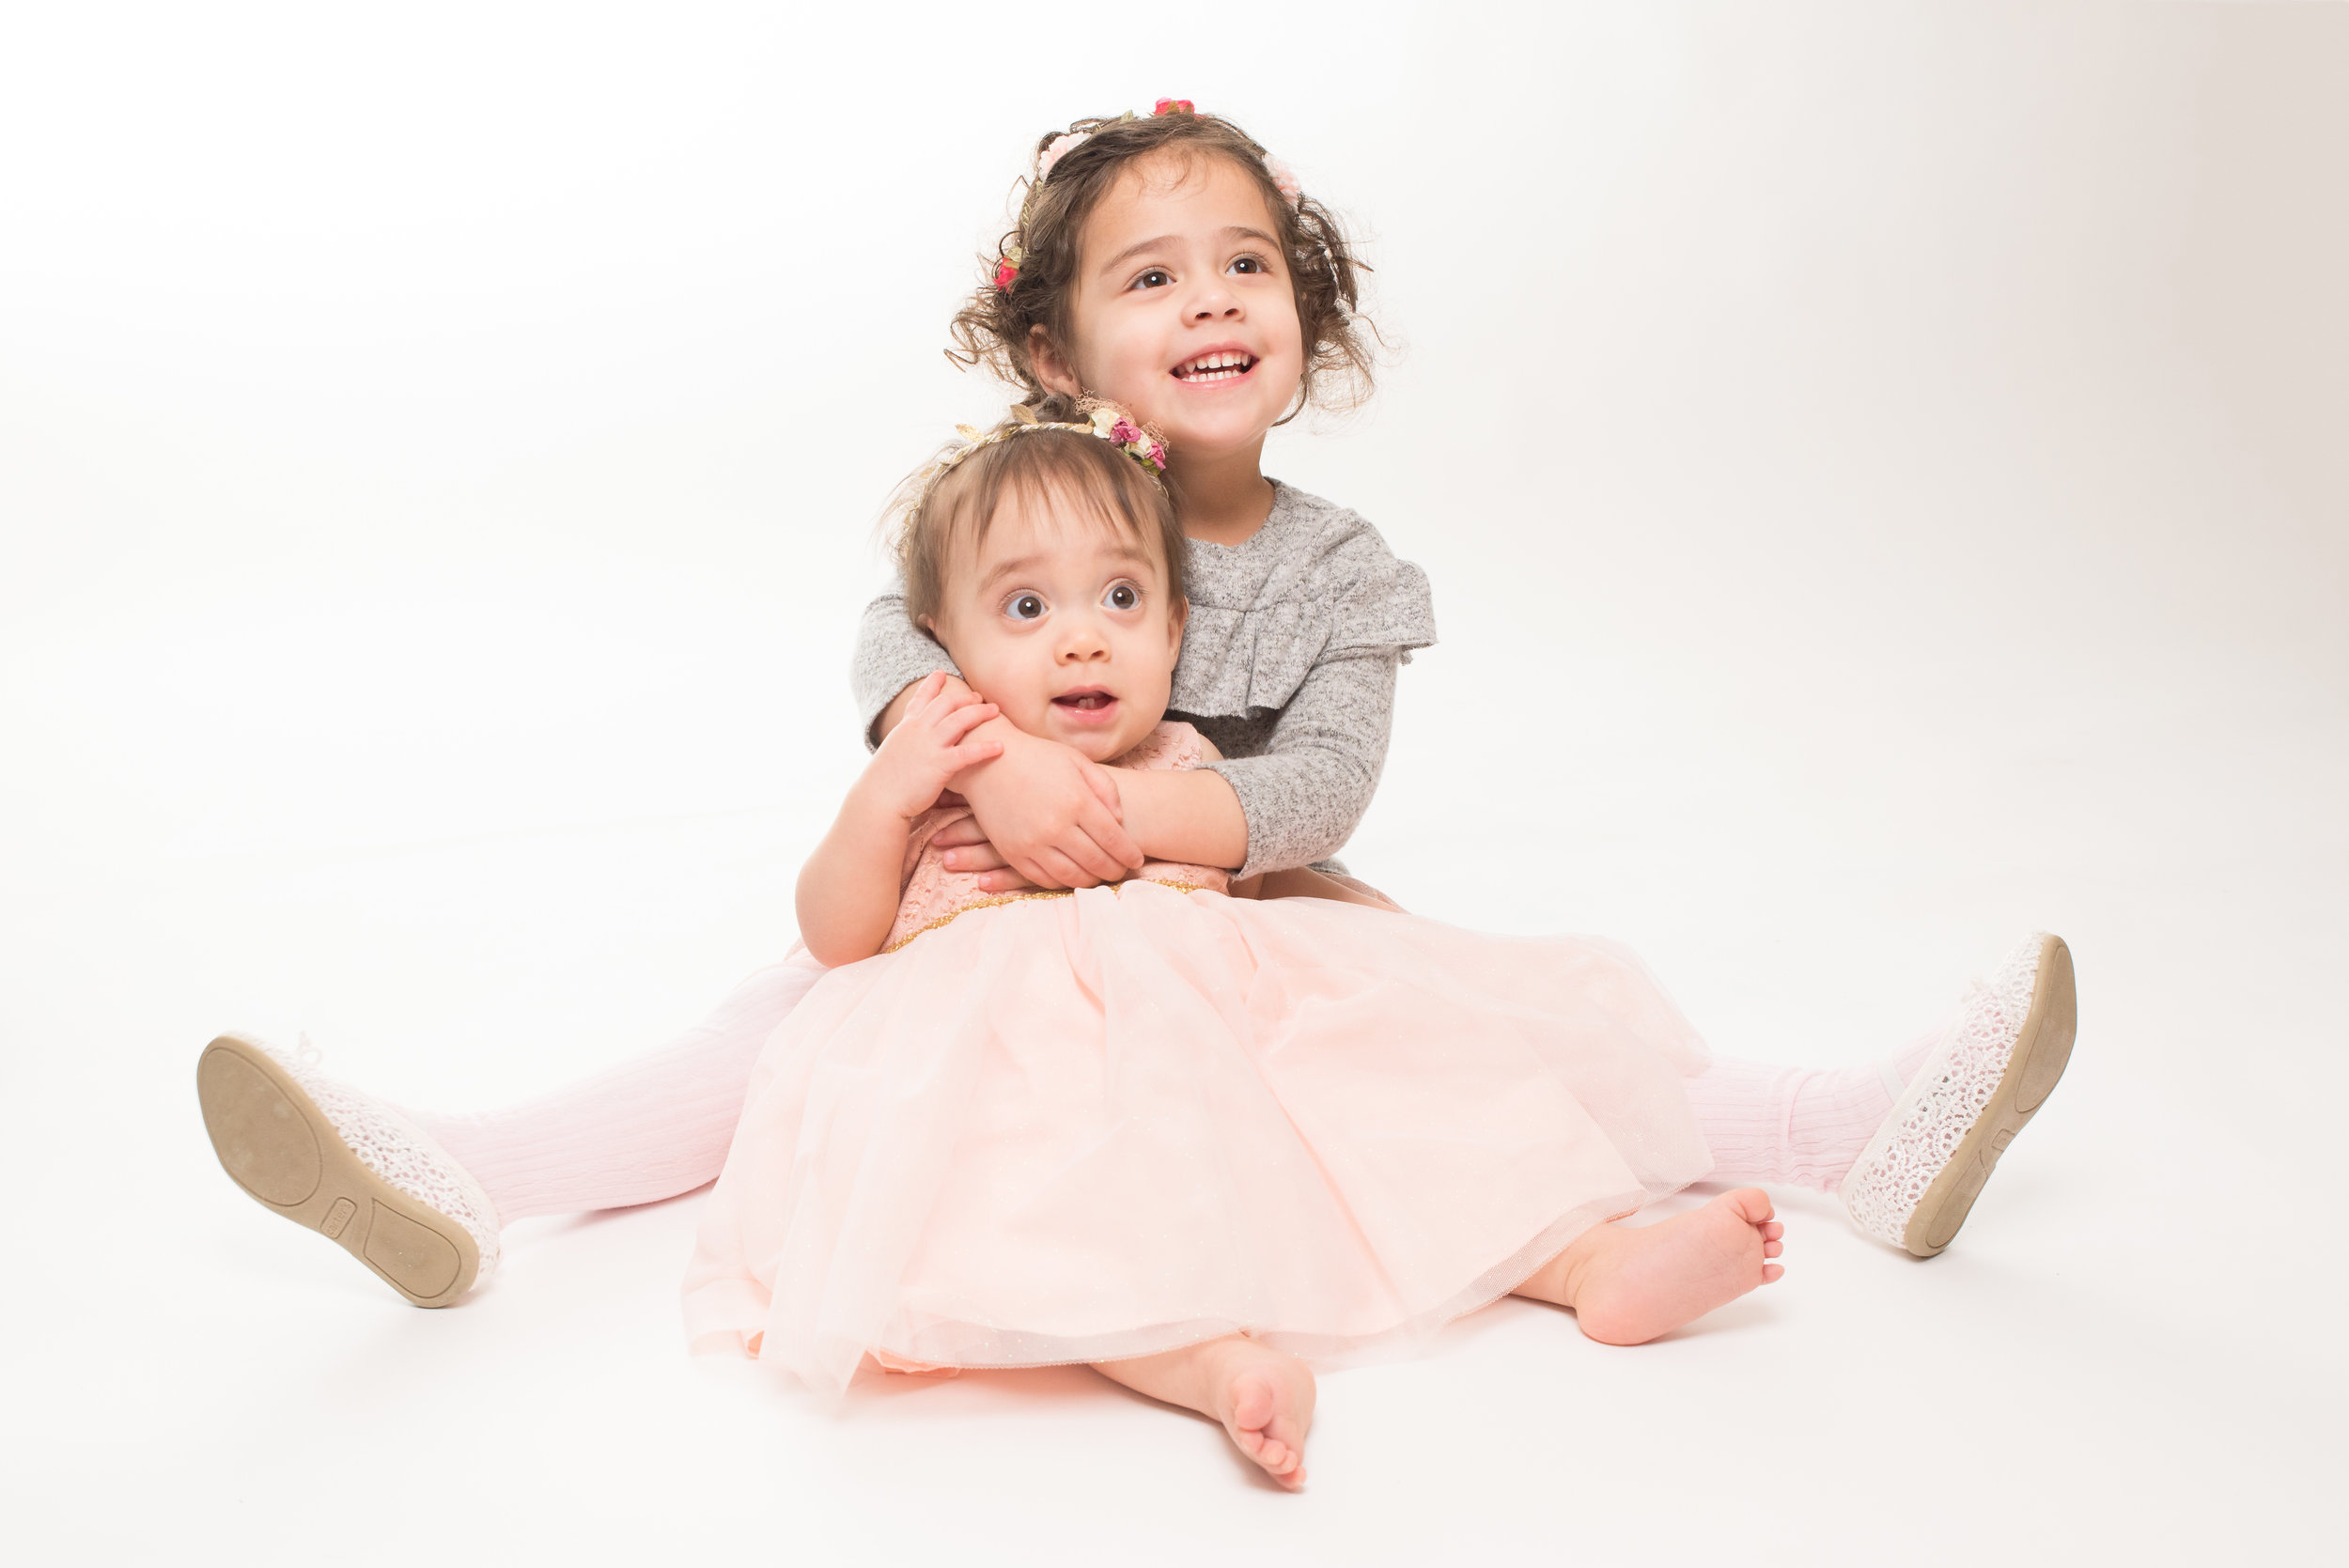 2018_February_04-Veronica_Sullivan_One_Year_Baby_Pics-44689-Edit.jpg